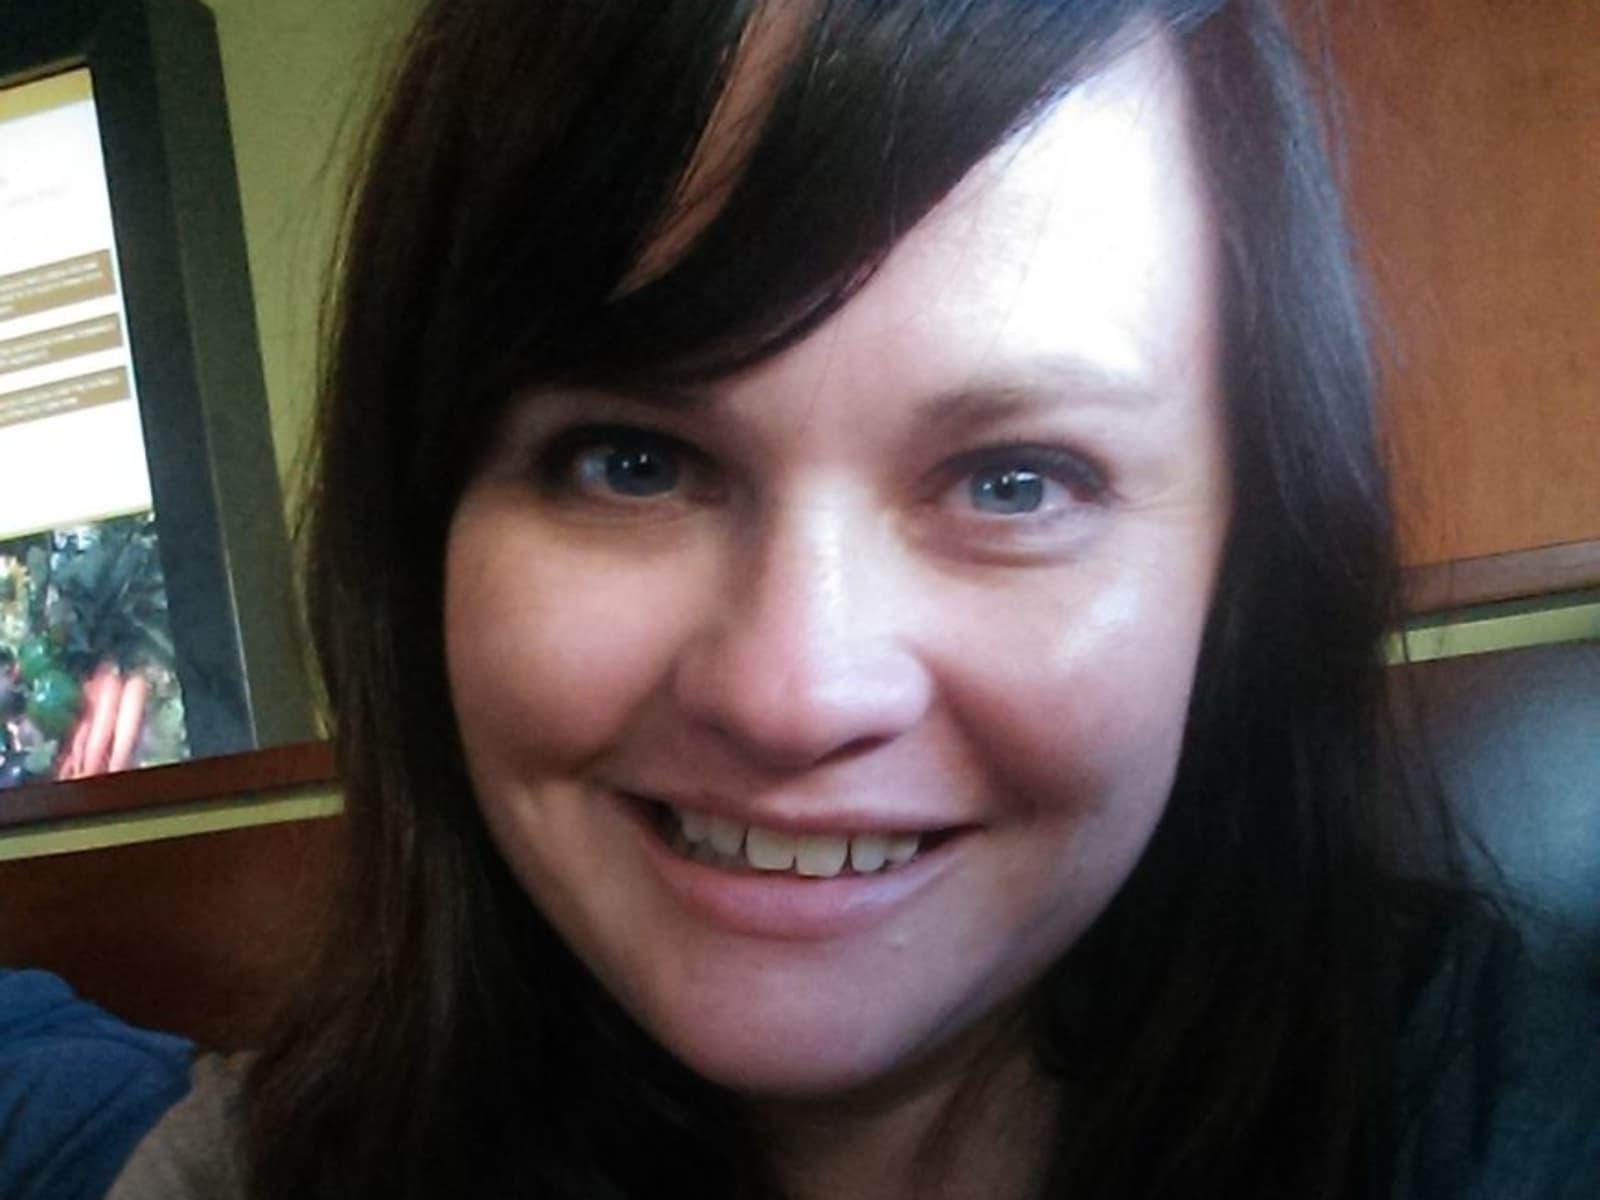 Amy from Portland, Oregon, United States